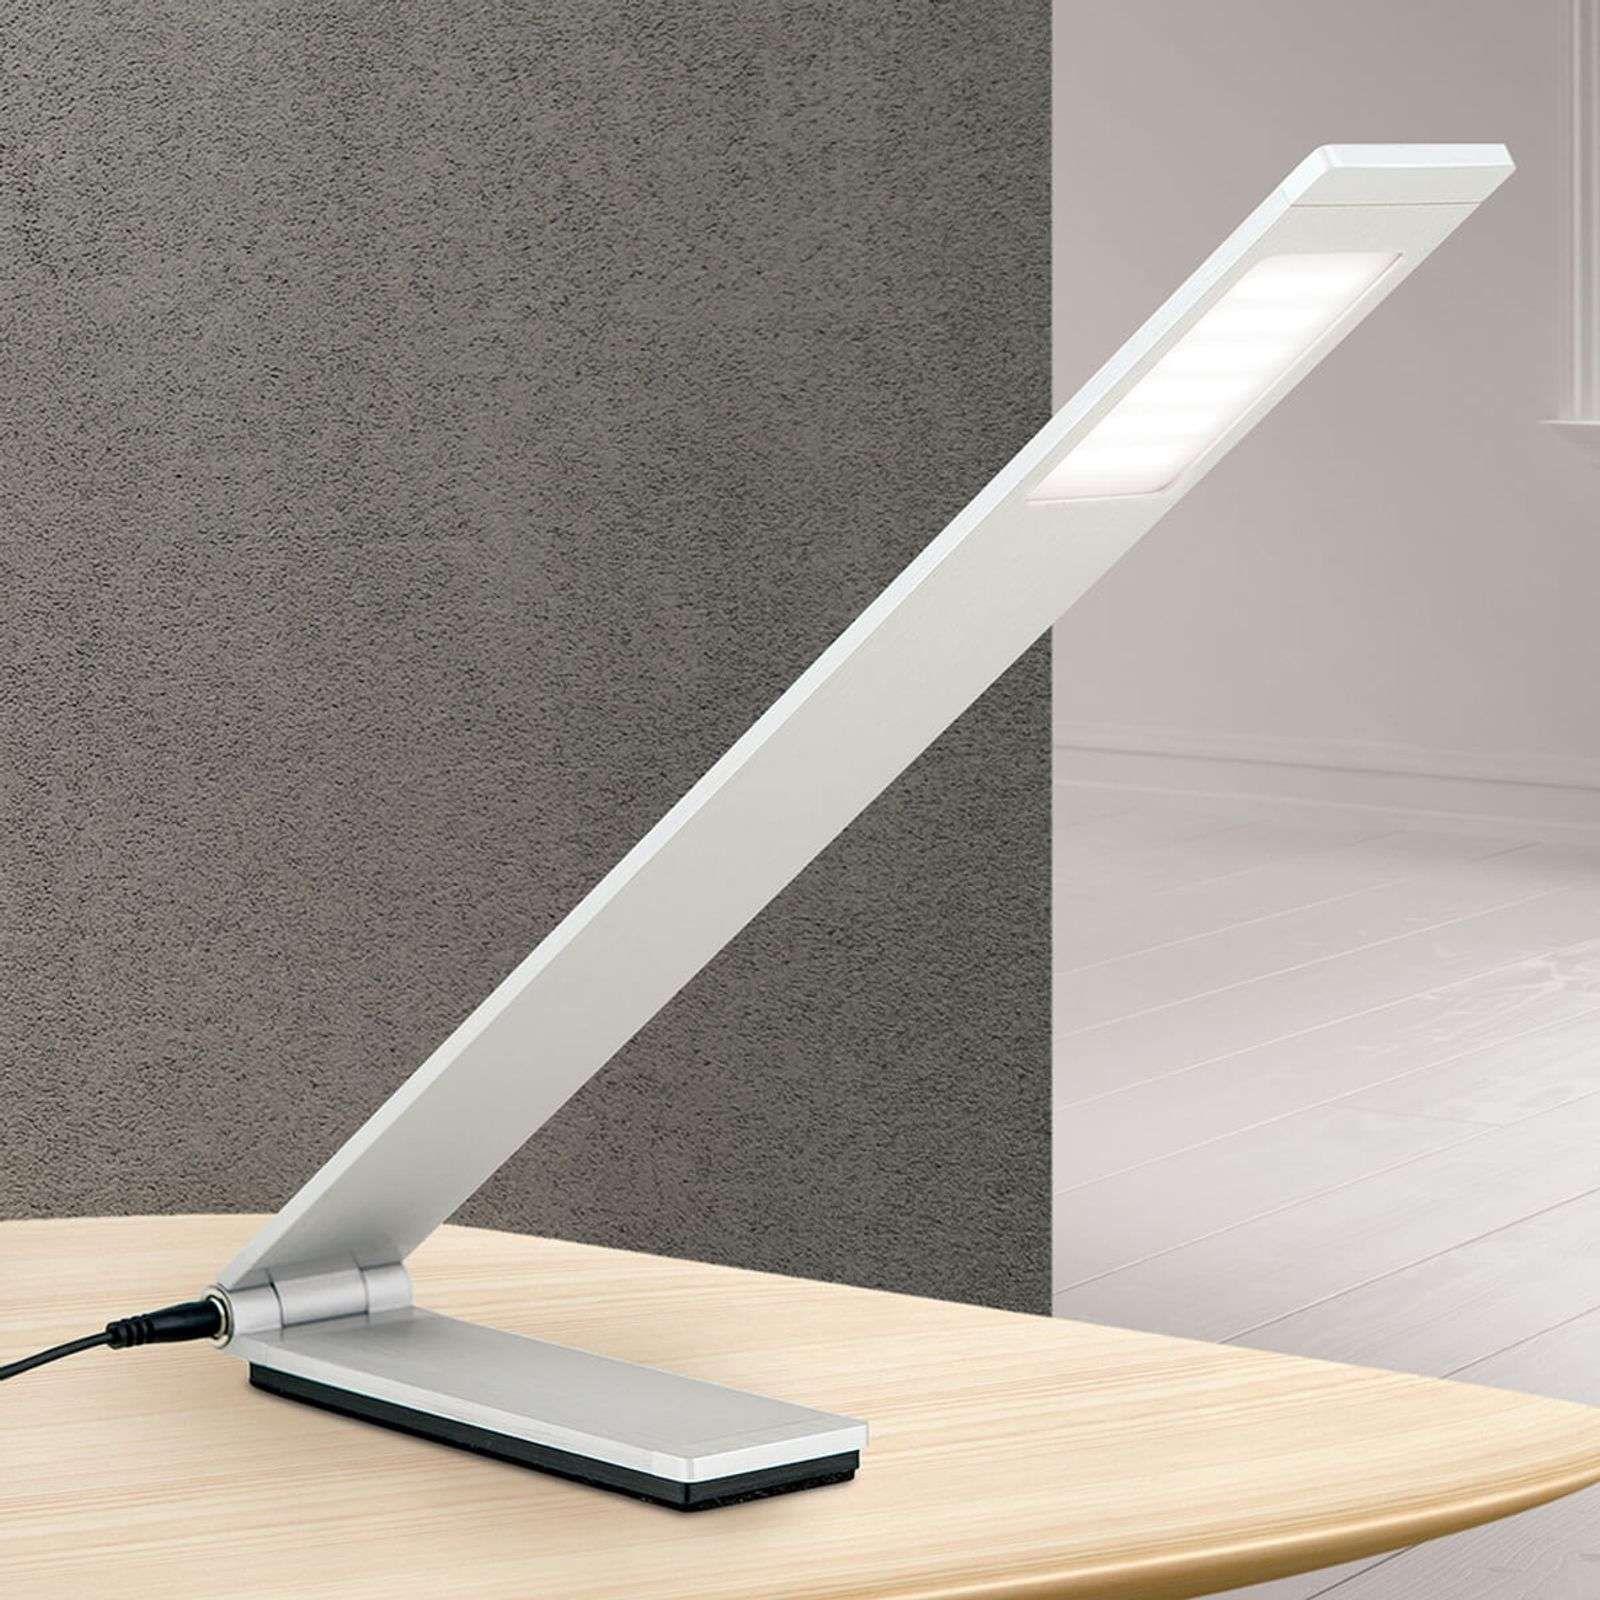 Kleine Tafellamp Design Schemerlamp Voor Buiten Tafellamp Bolvoet Tafellamp Leenbakker Tafellamp Di Lampe De Bureau Led Lampe De Bureau Lampes De Table